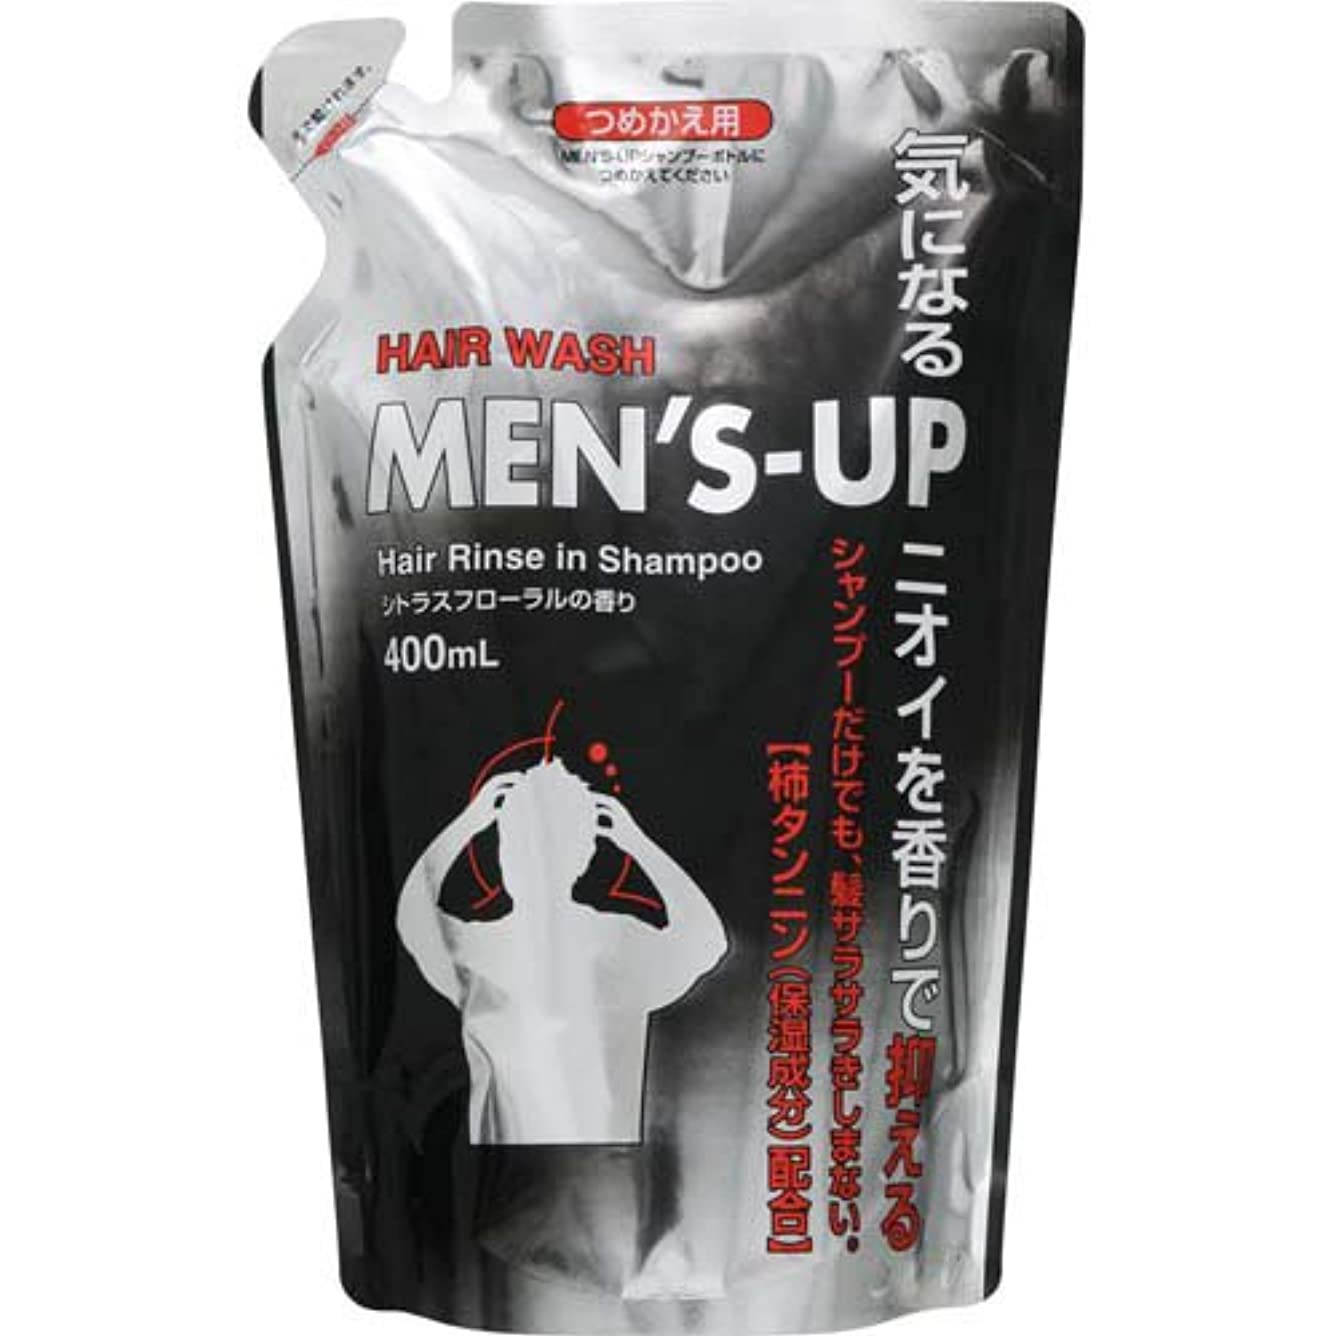 MEN'S-UP リンスINシャンプー 詰替 400ml